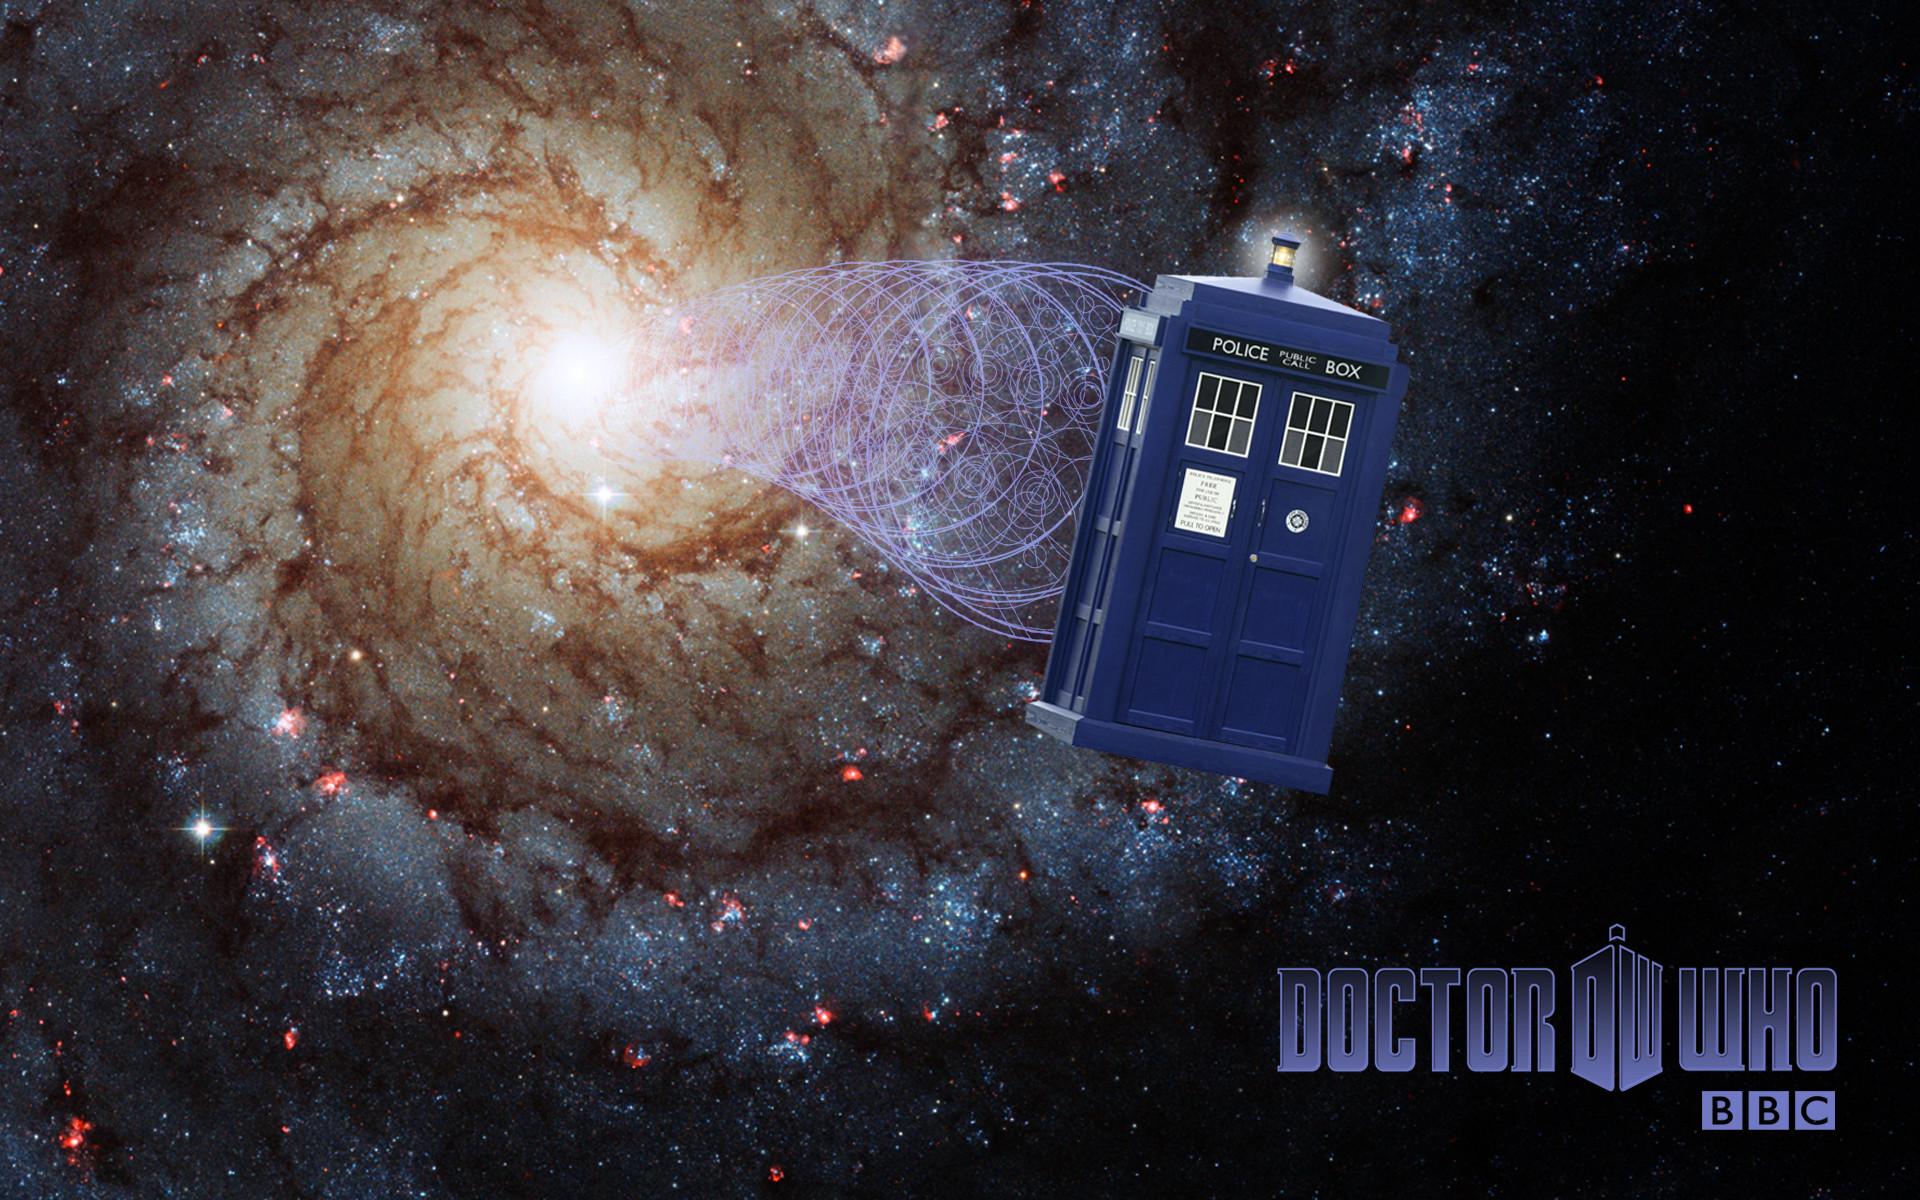 Doctor Who Tardis Desktop Doctor Who Wallpapers Tardis